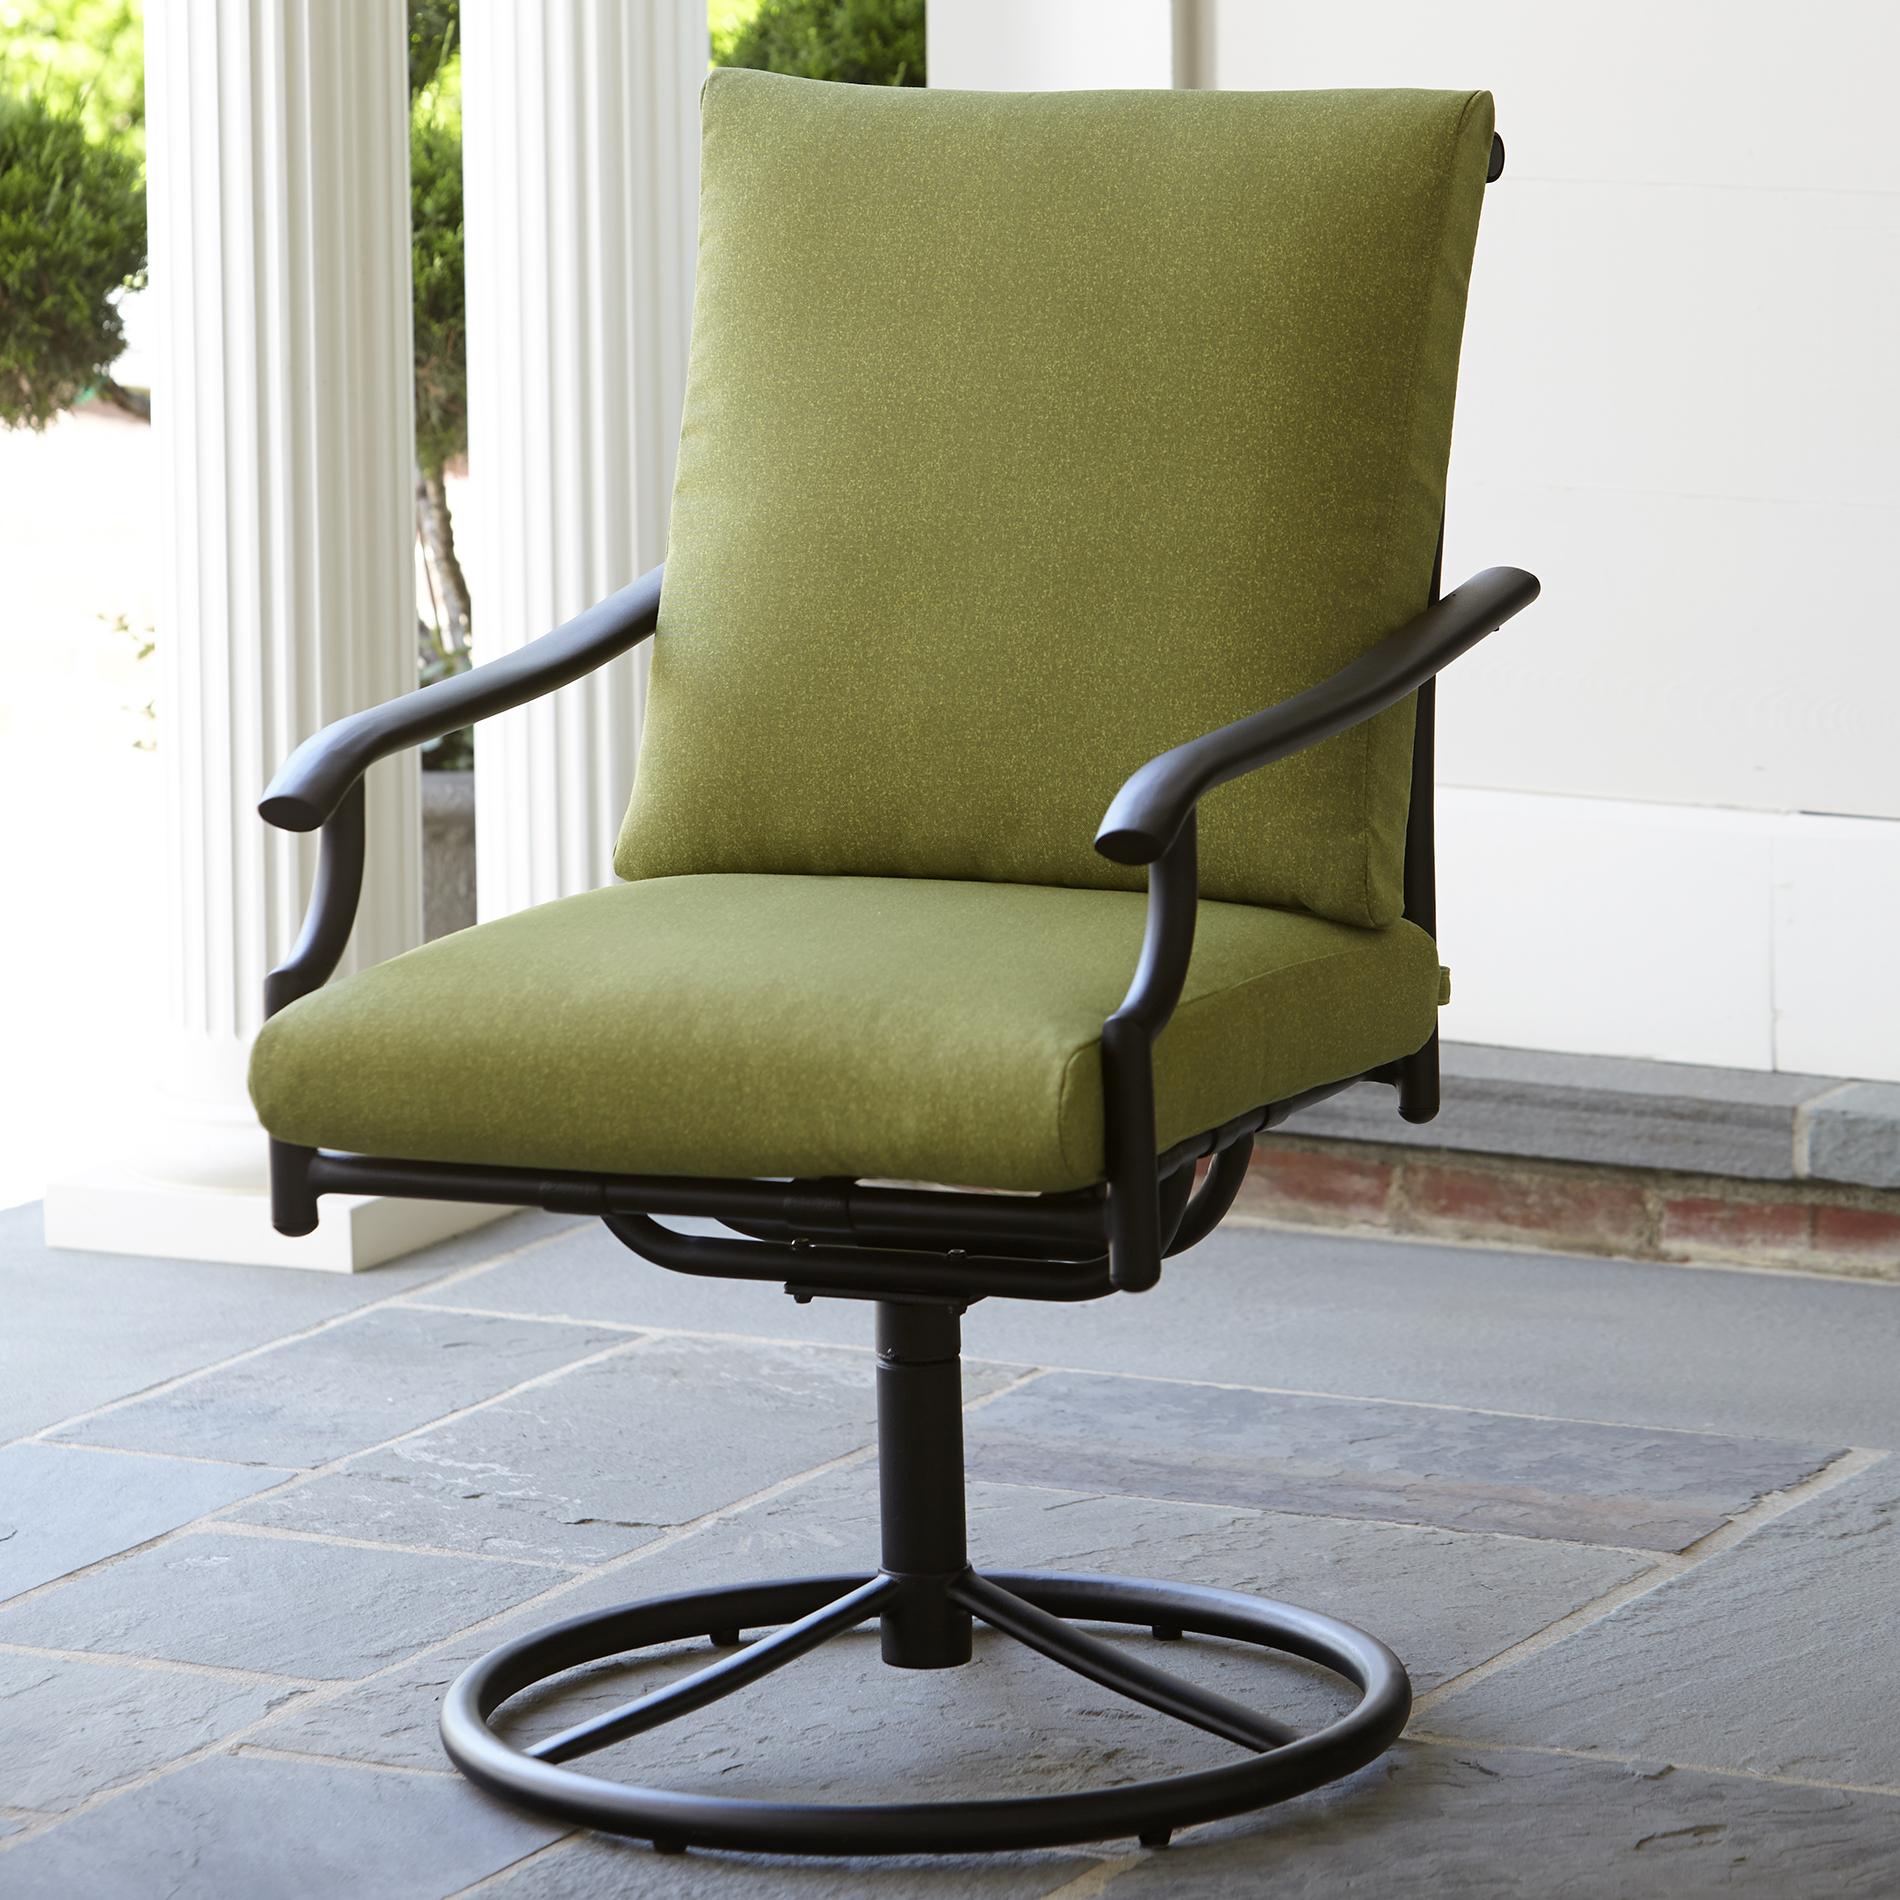 Garden Oasis Rockford 1pk Swivel Dining Chair - Outdoor